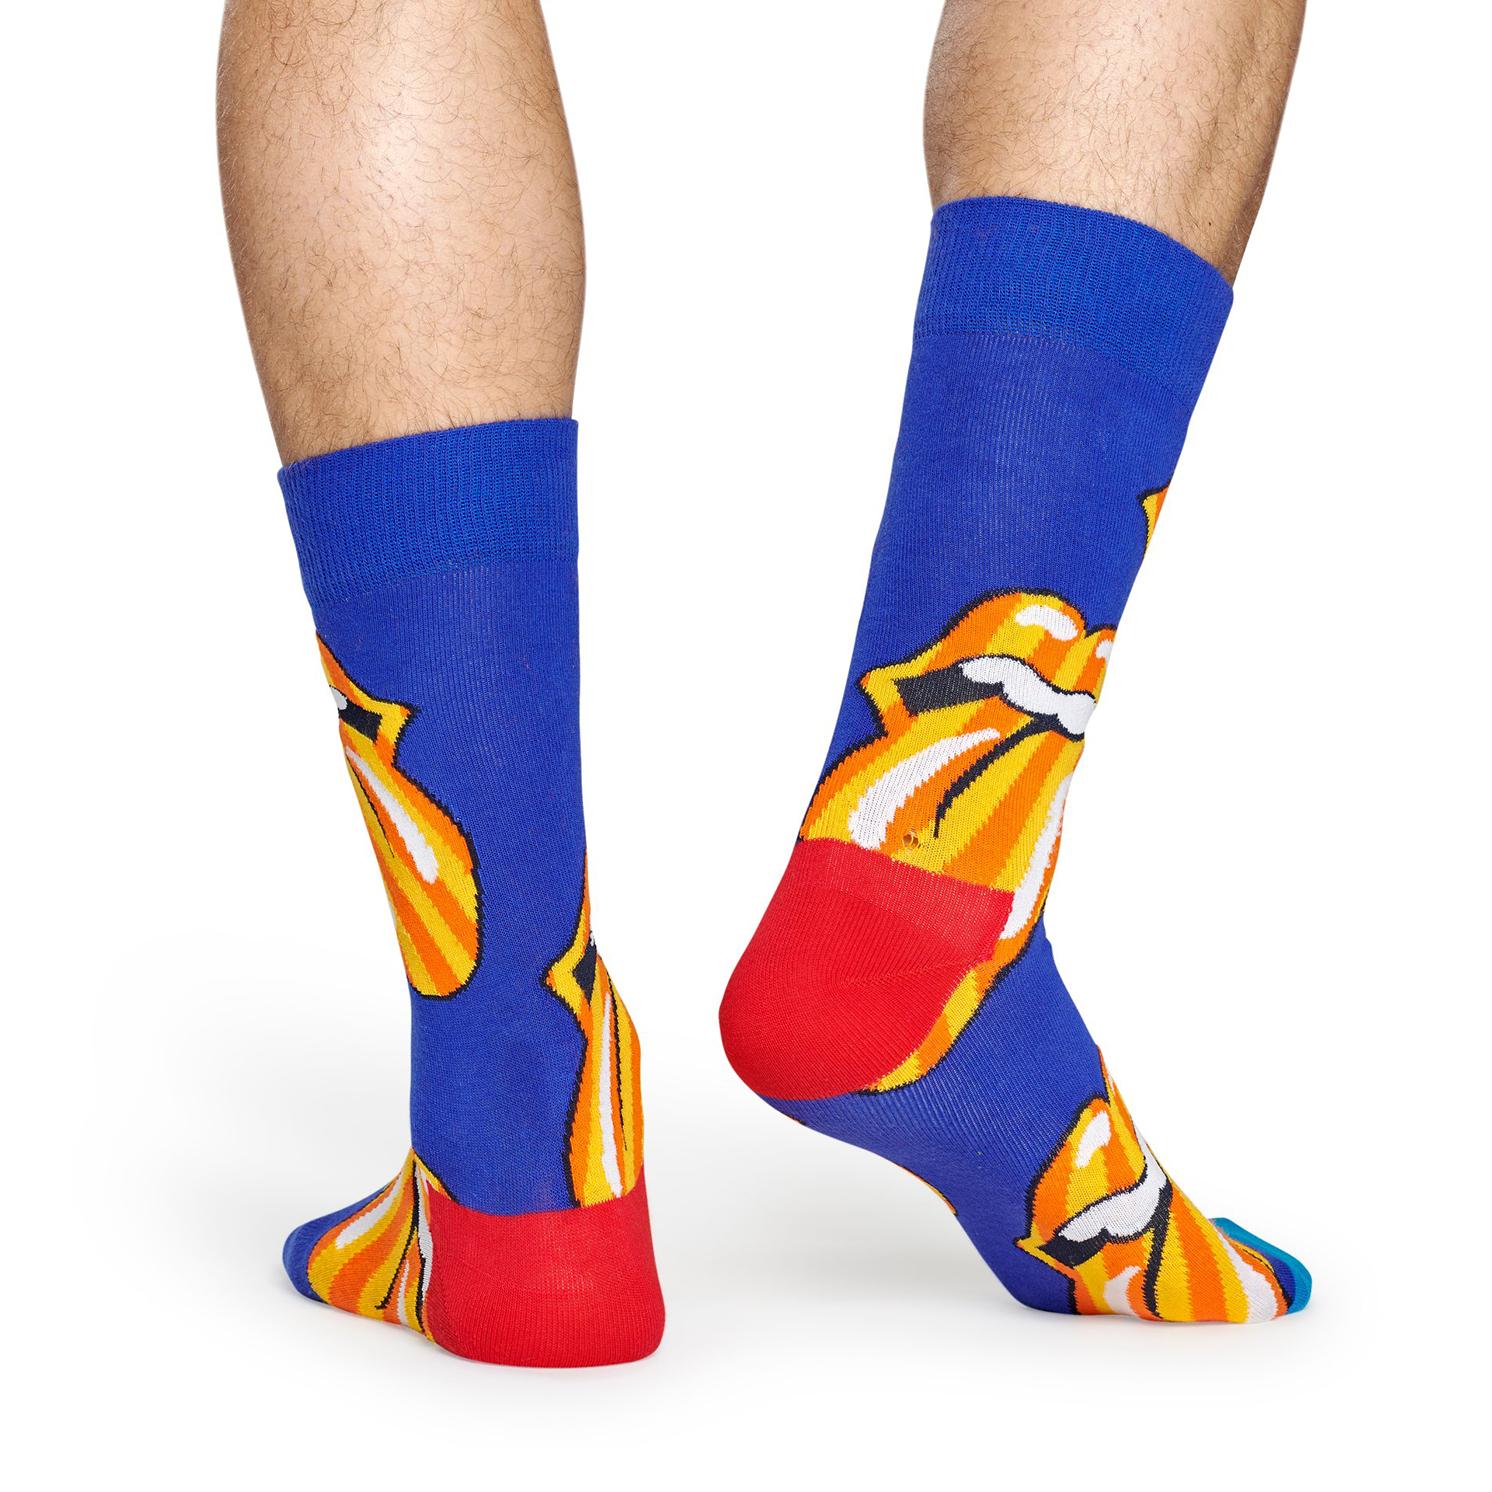 Happy Socks – Rolling Stones Tumbling Stripes Sock